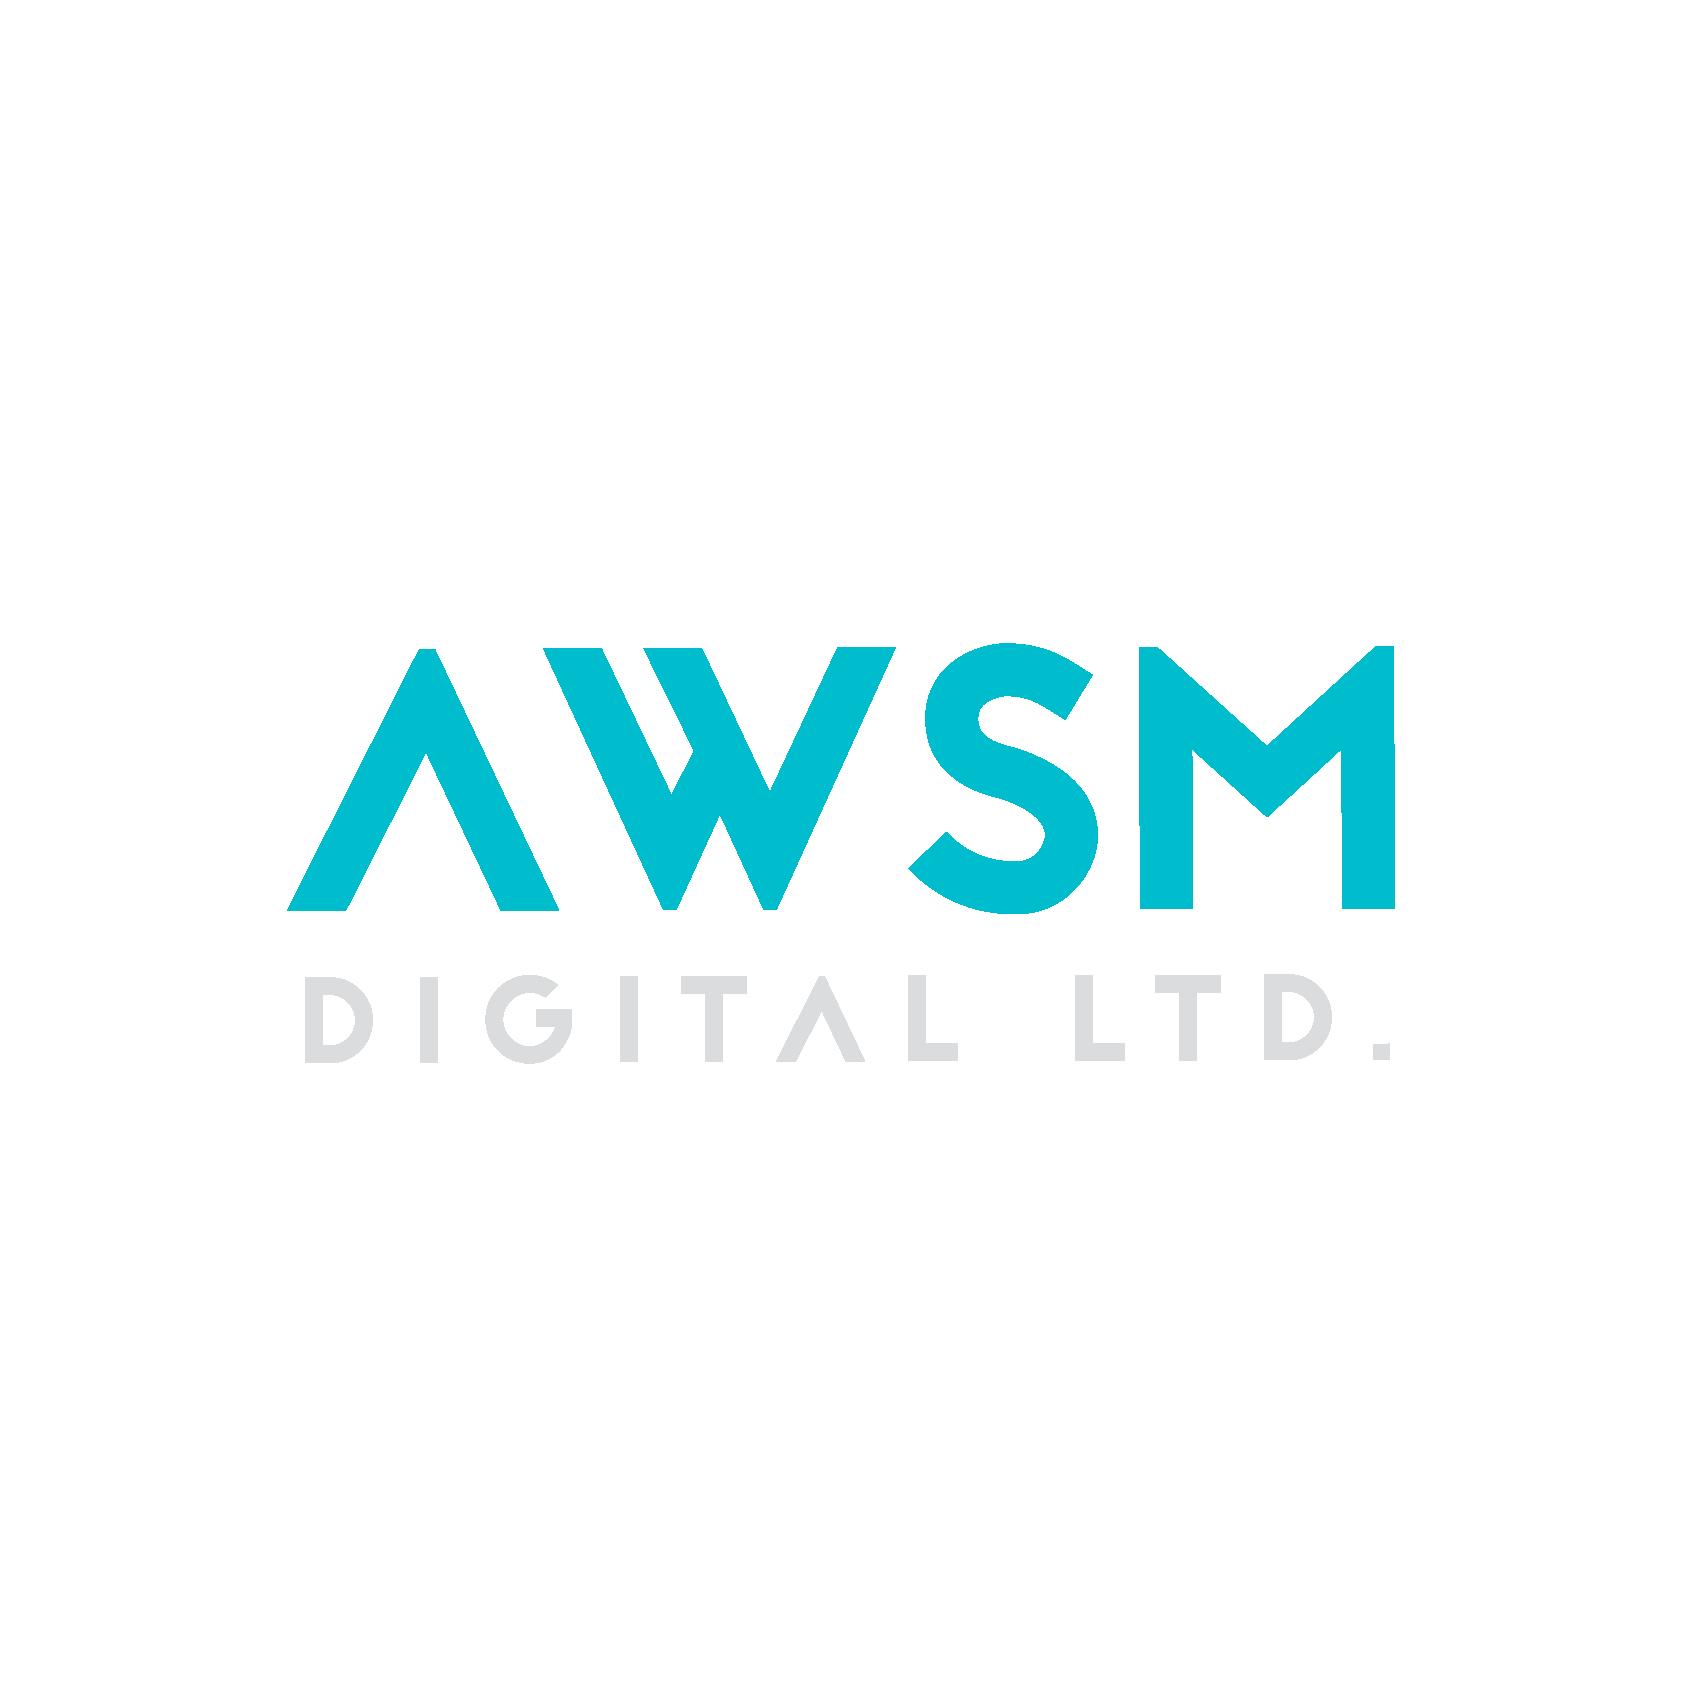 AWSM Digital